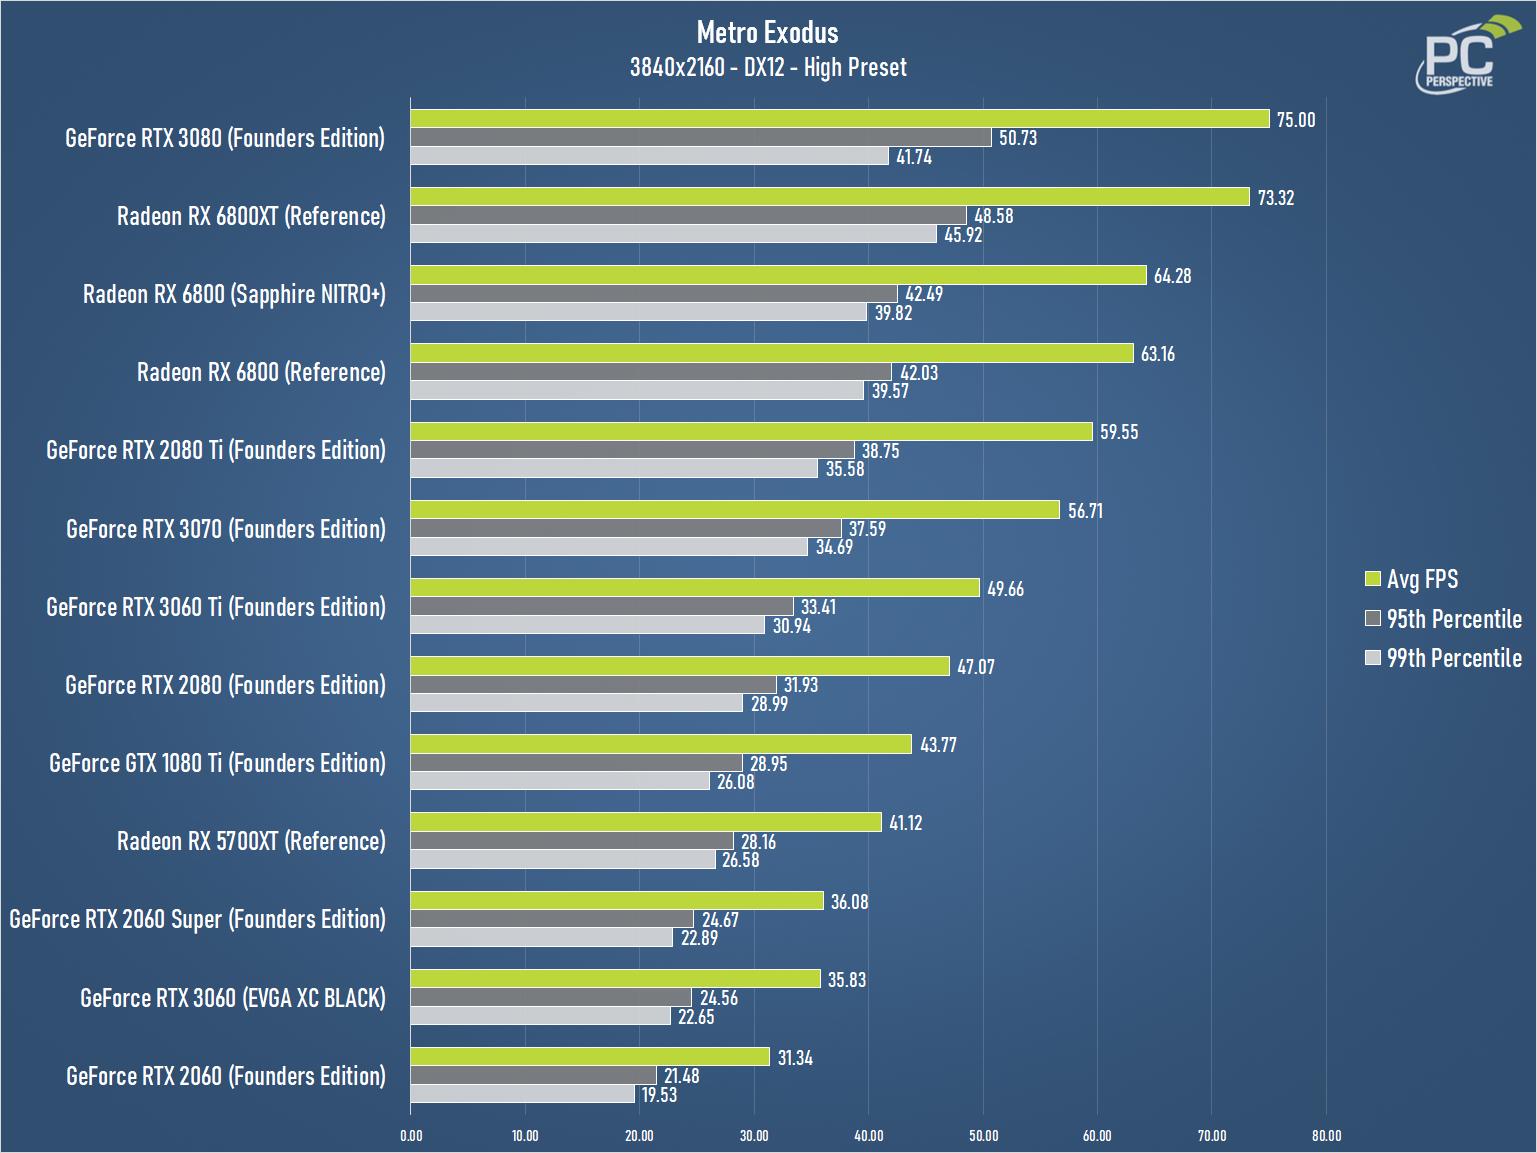 GeForce RTX 3060 EVGA XC BLACK Metro Exodus 2160 Chart